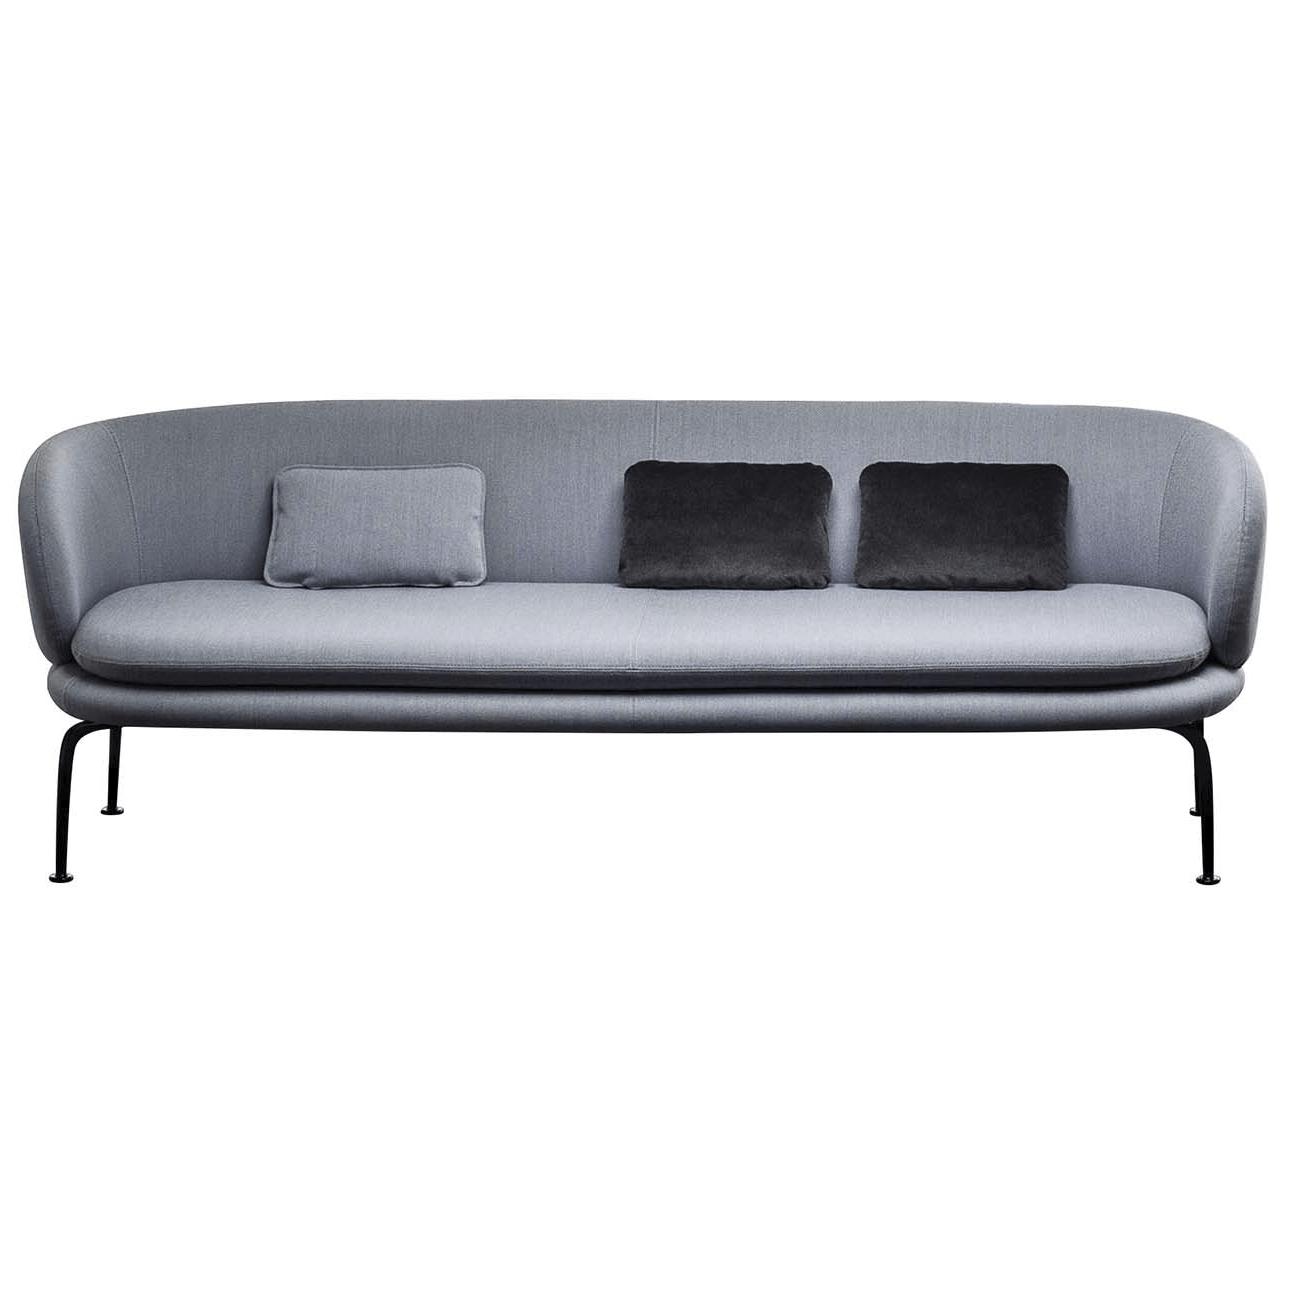 Soave sofa1